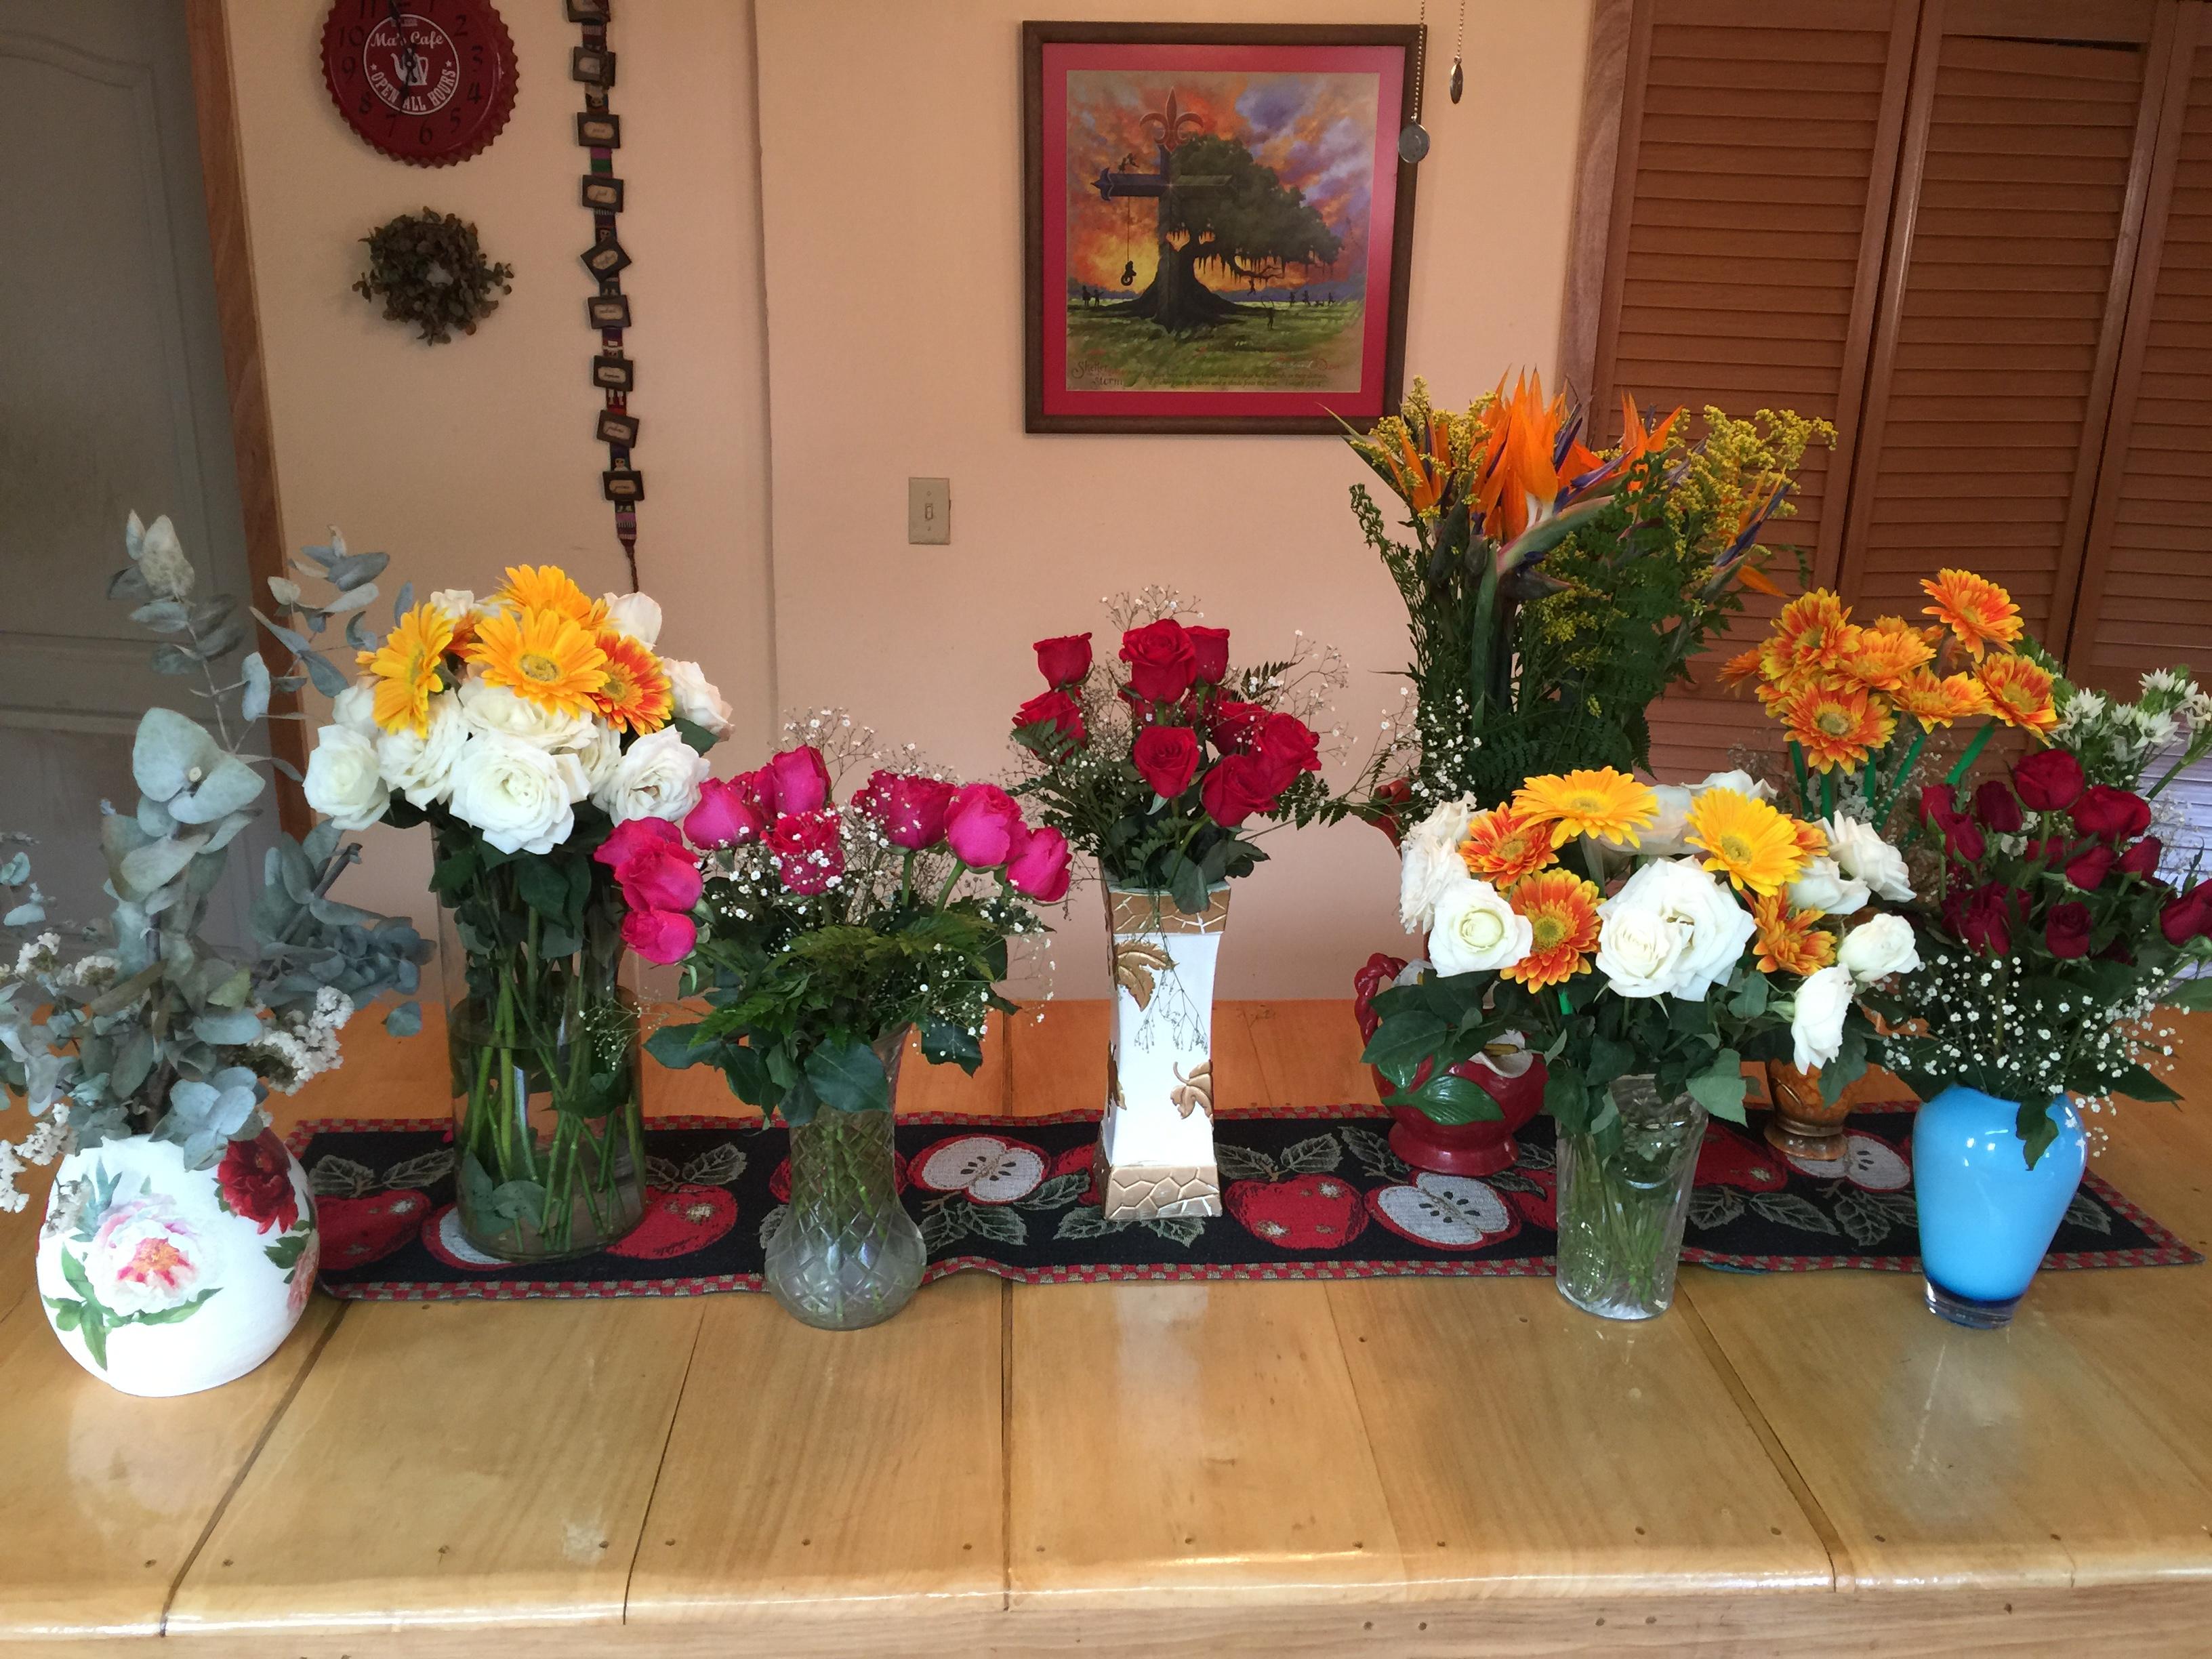 More of Dottie's birthday flowers